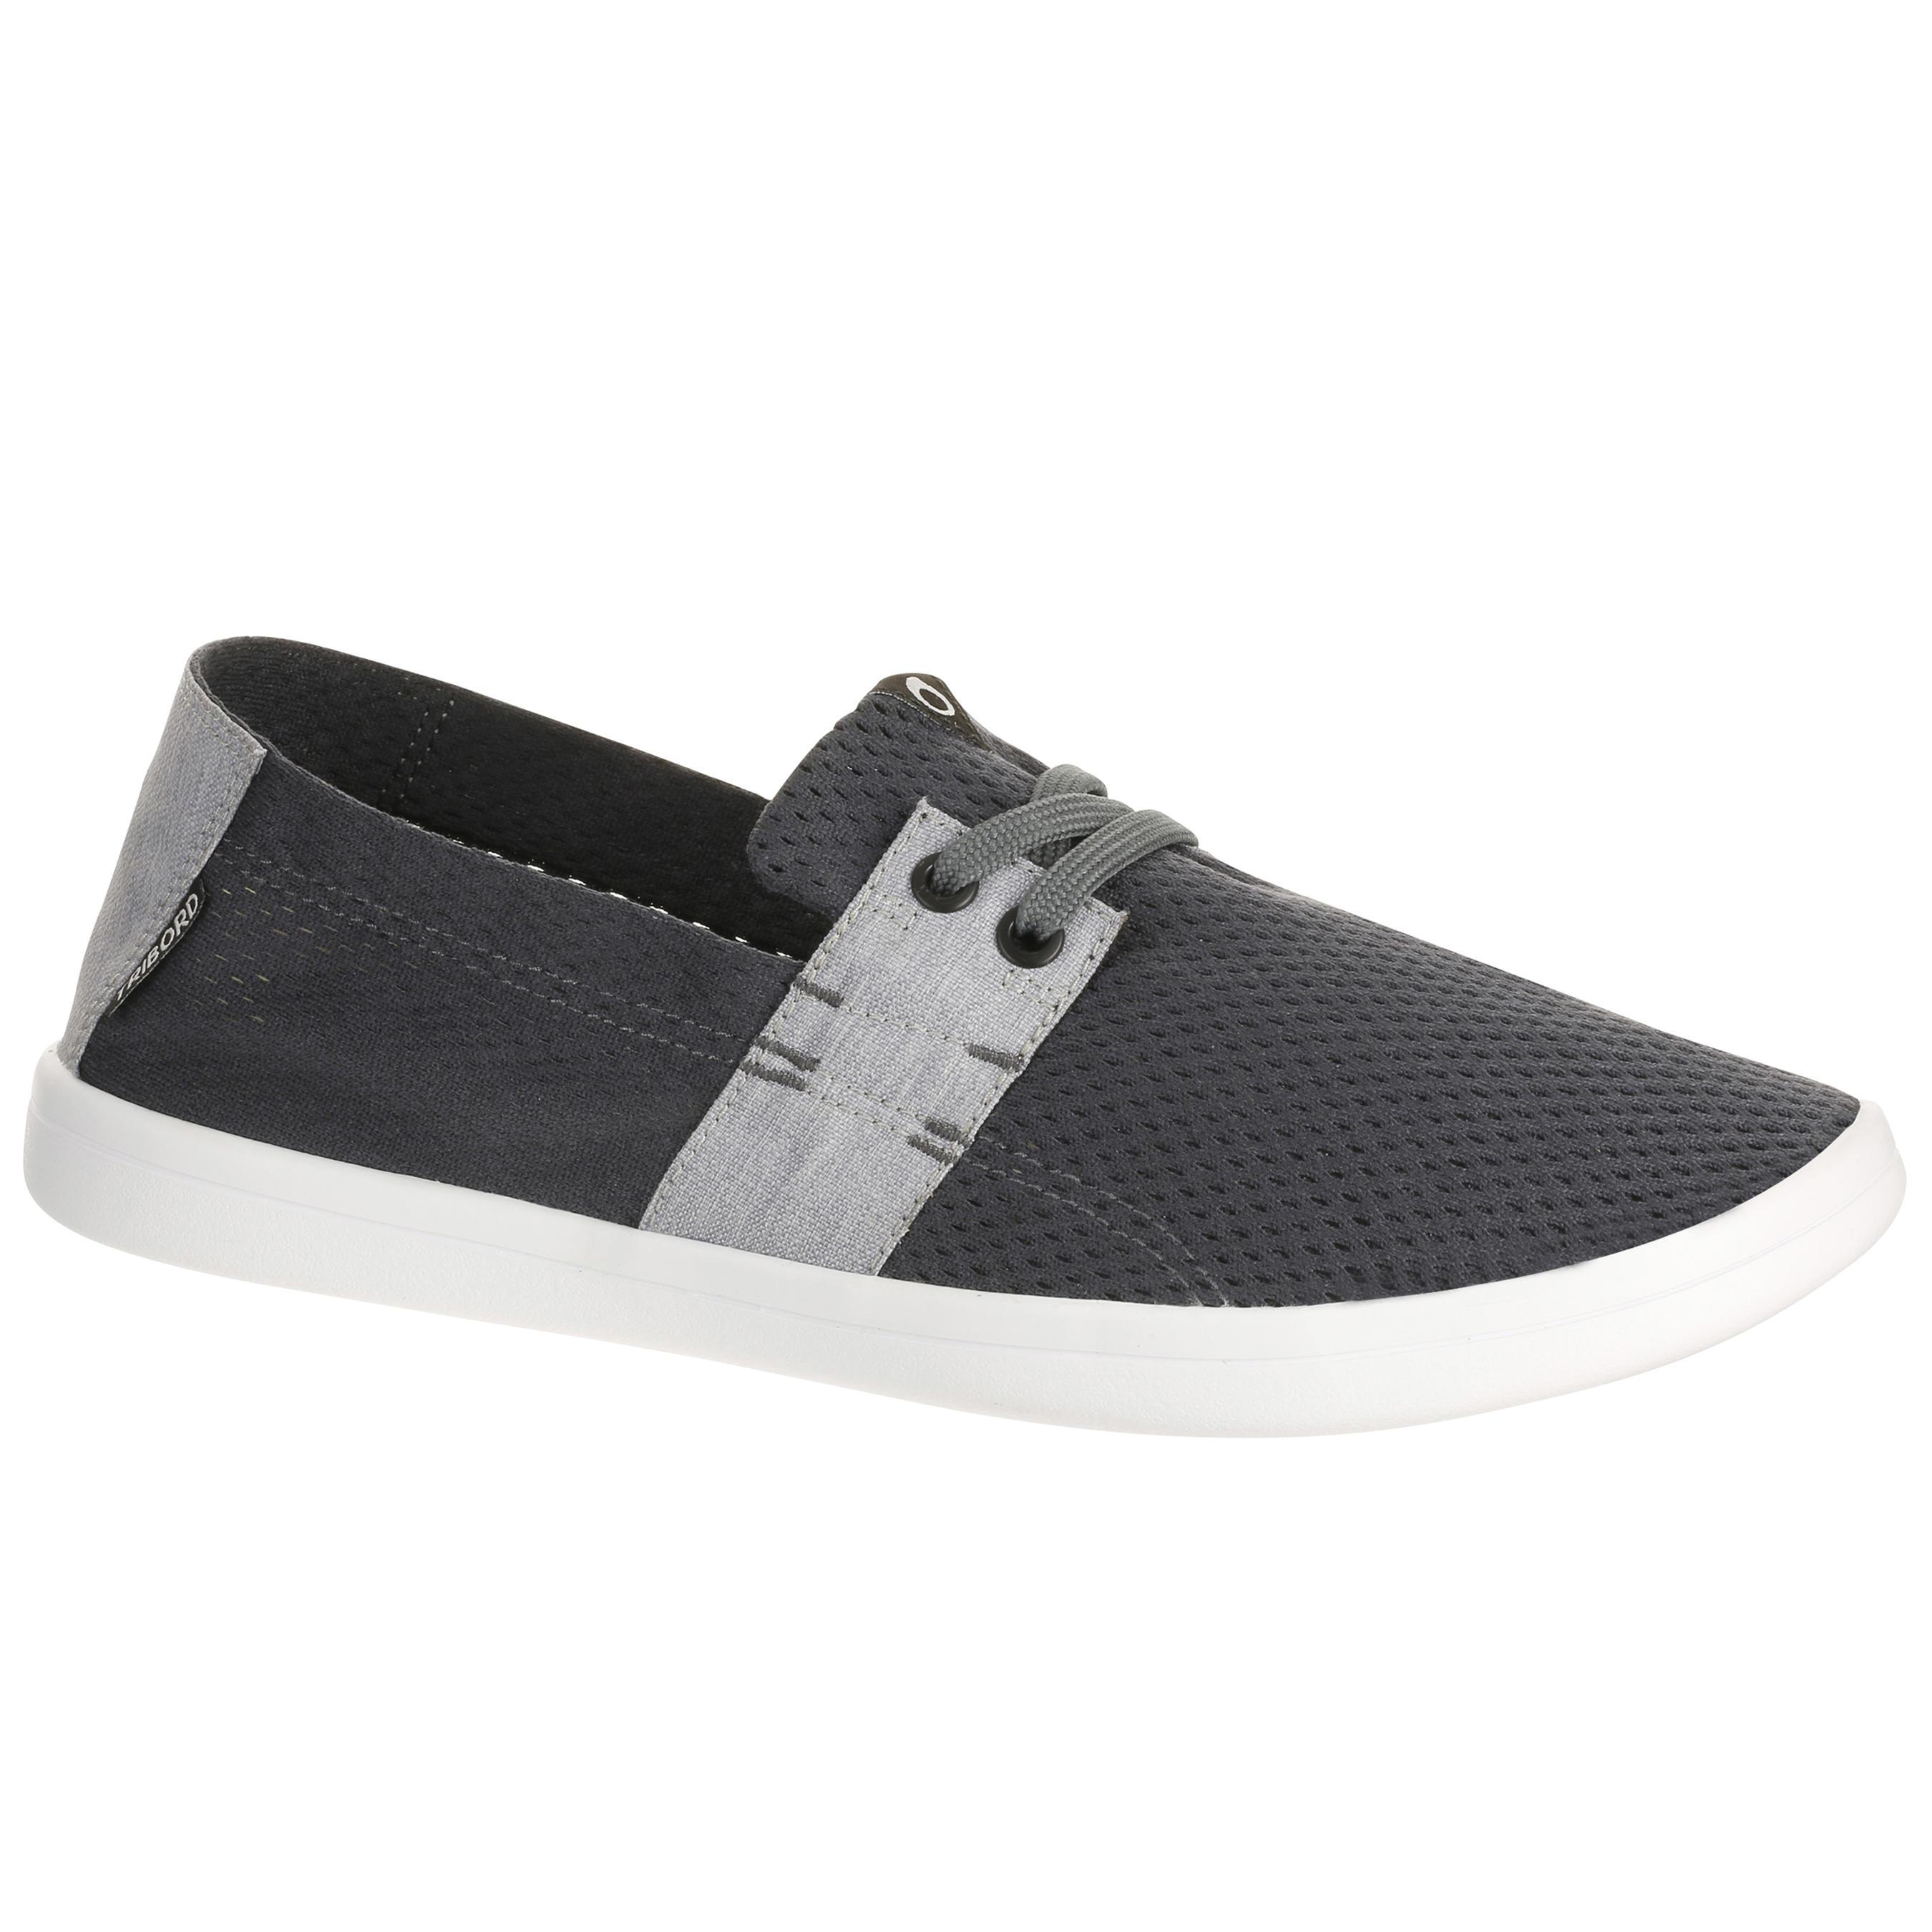 AREETA M Men's Shoes - Dark Grey